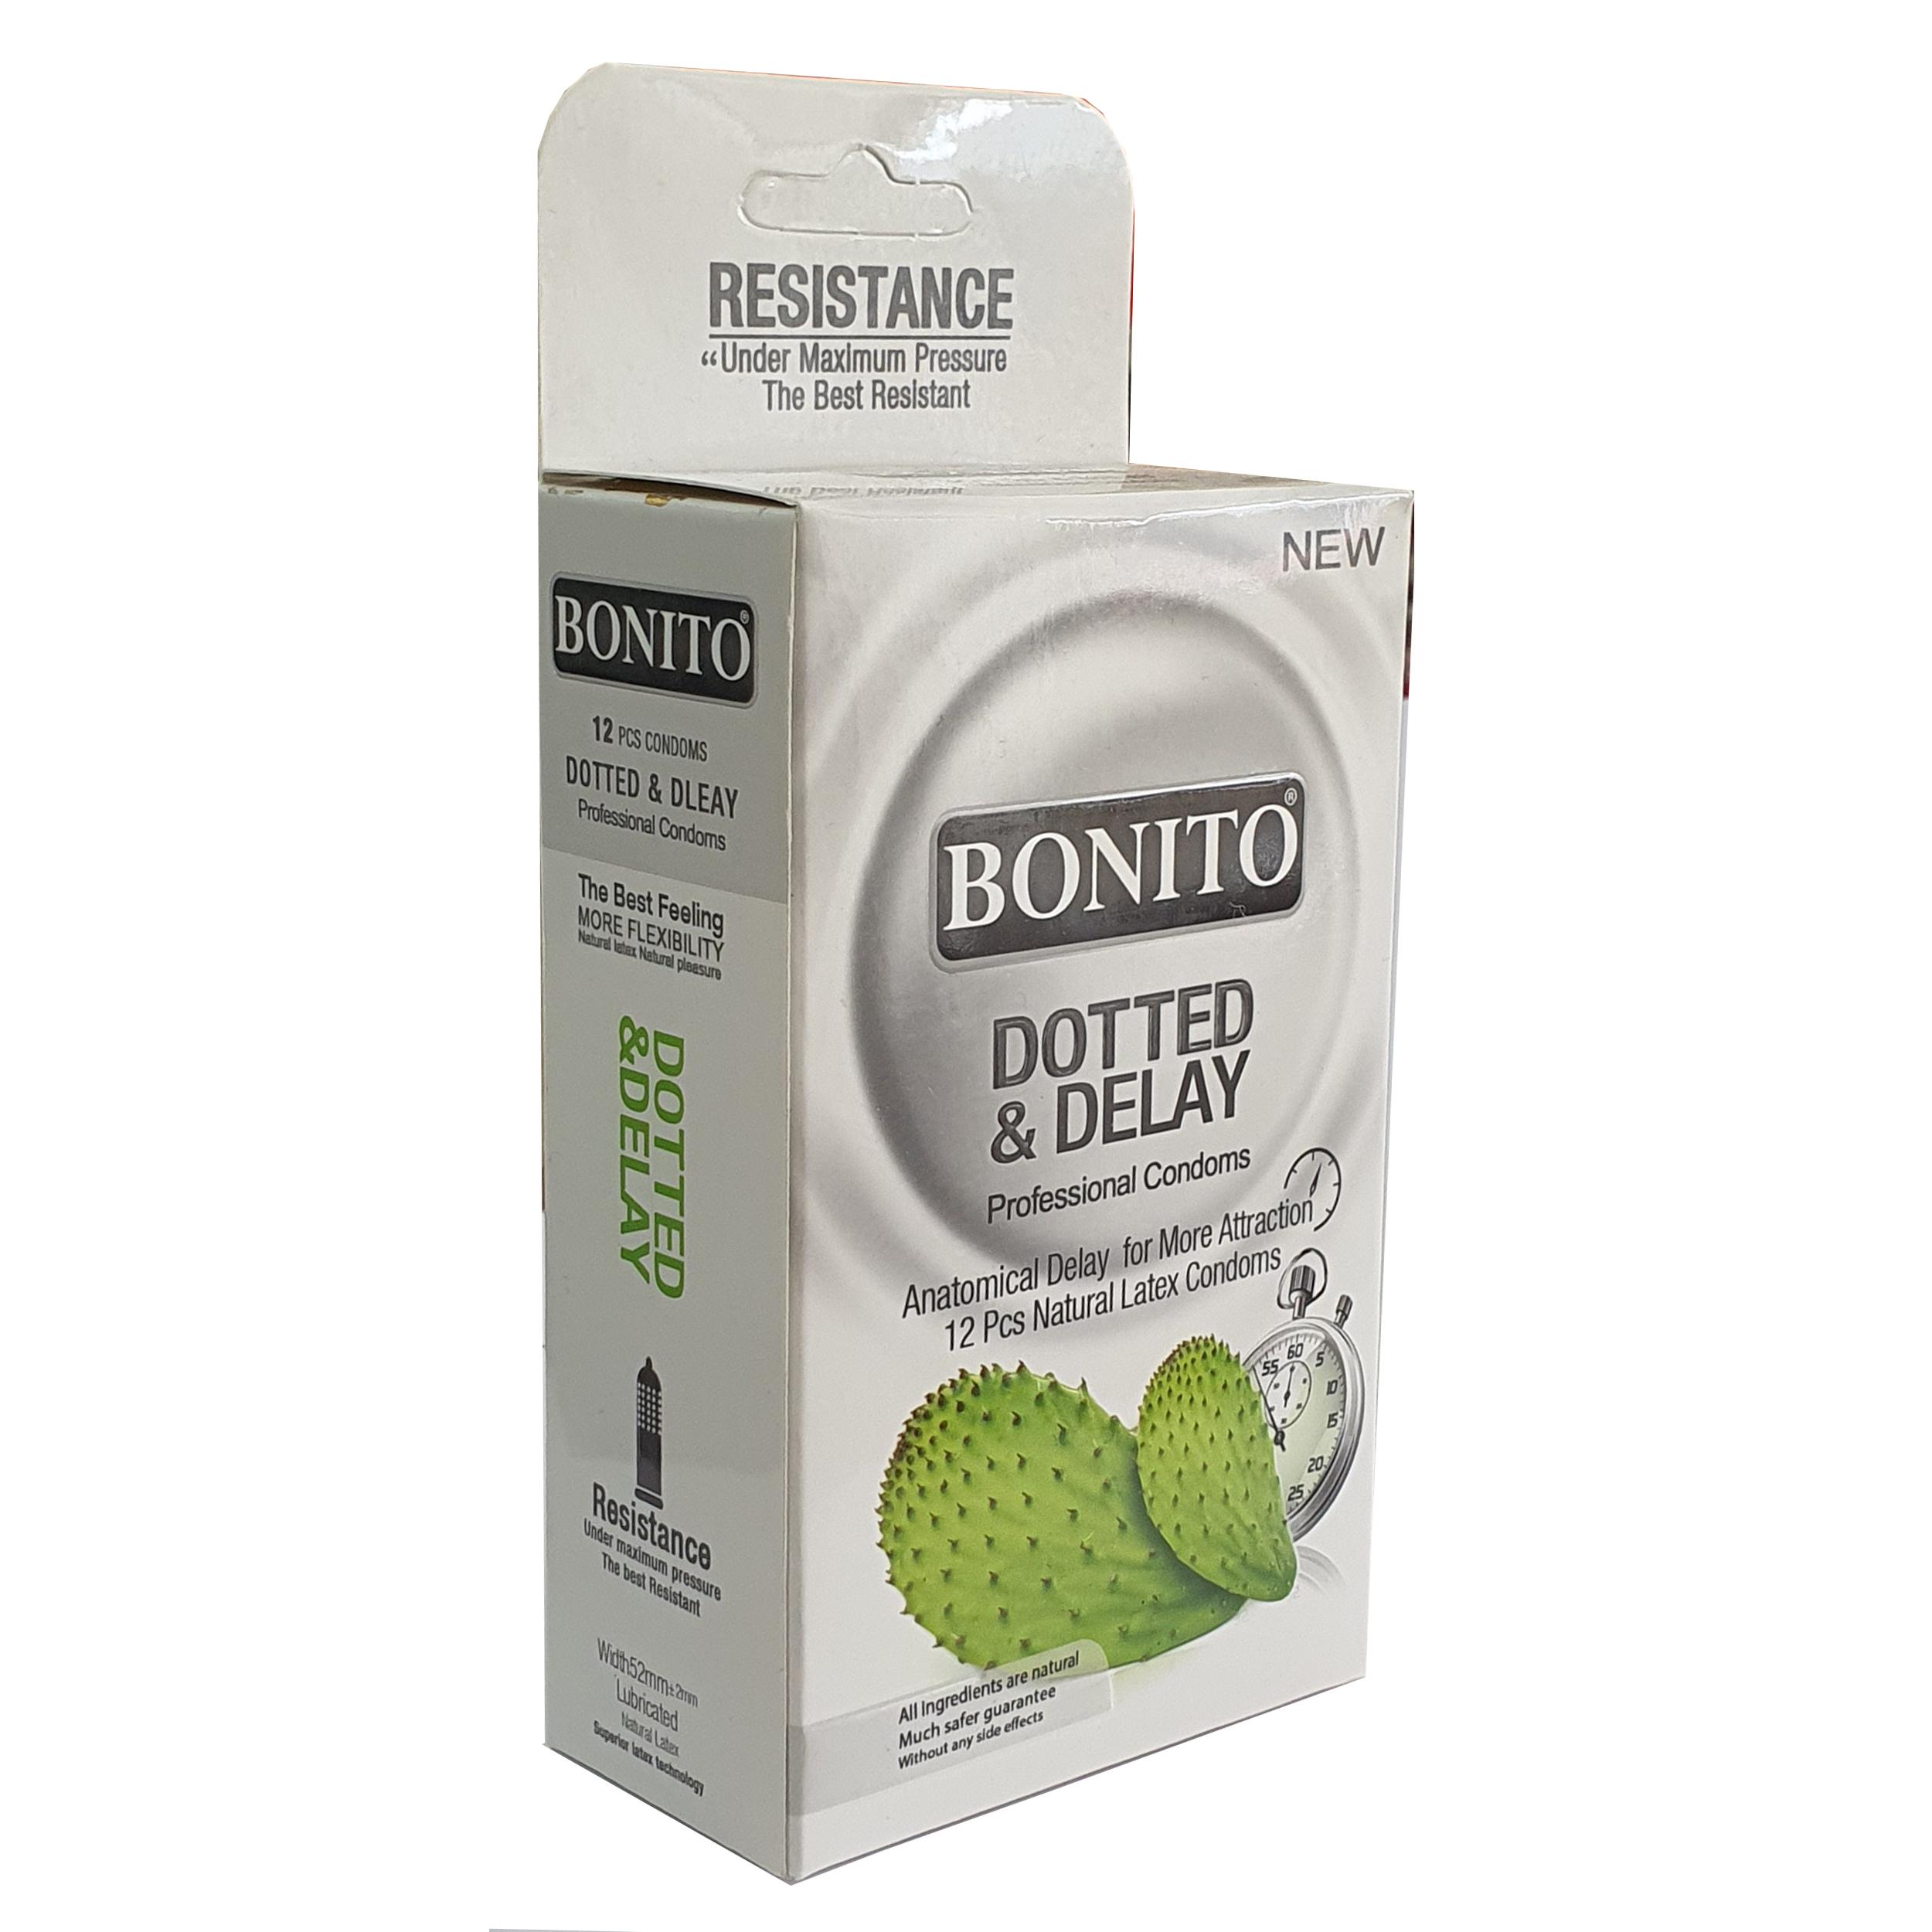 کاندوم بونیتو مدل Dotted & Delay بسته 12 عددی main 1 1